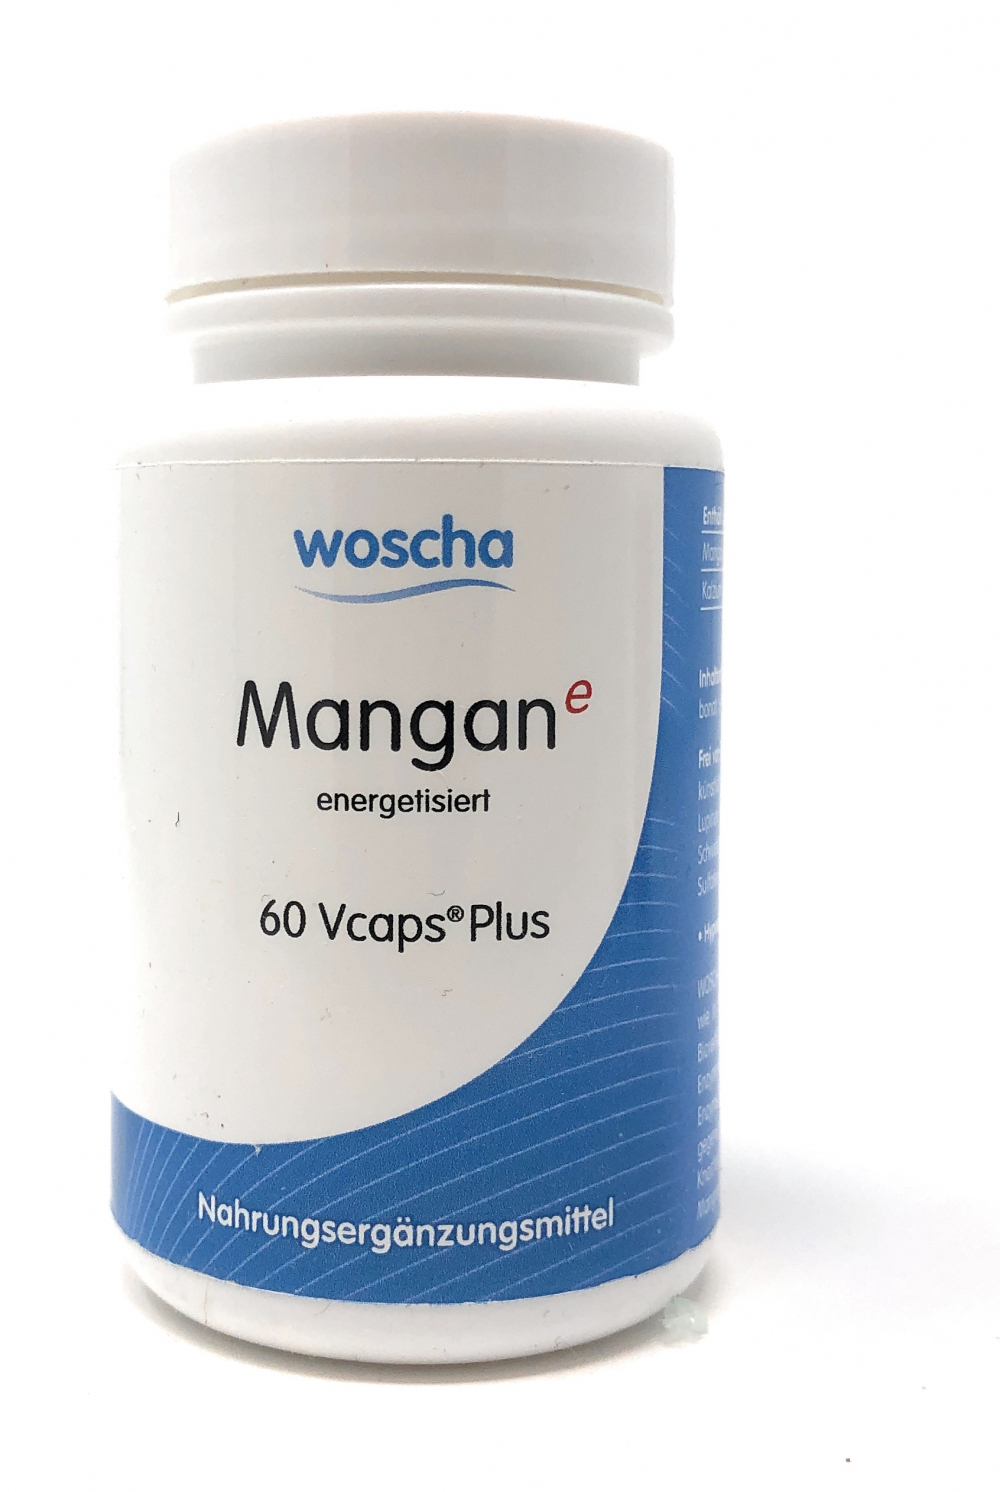 woscha Mangan energetisiert 60 Vcaps Plus (23g) (vegan)